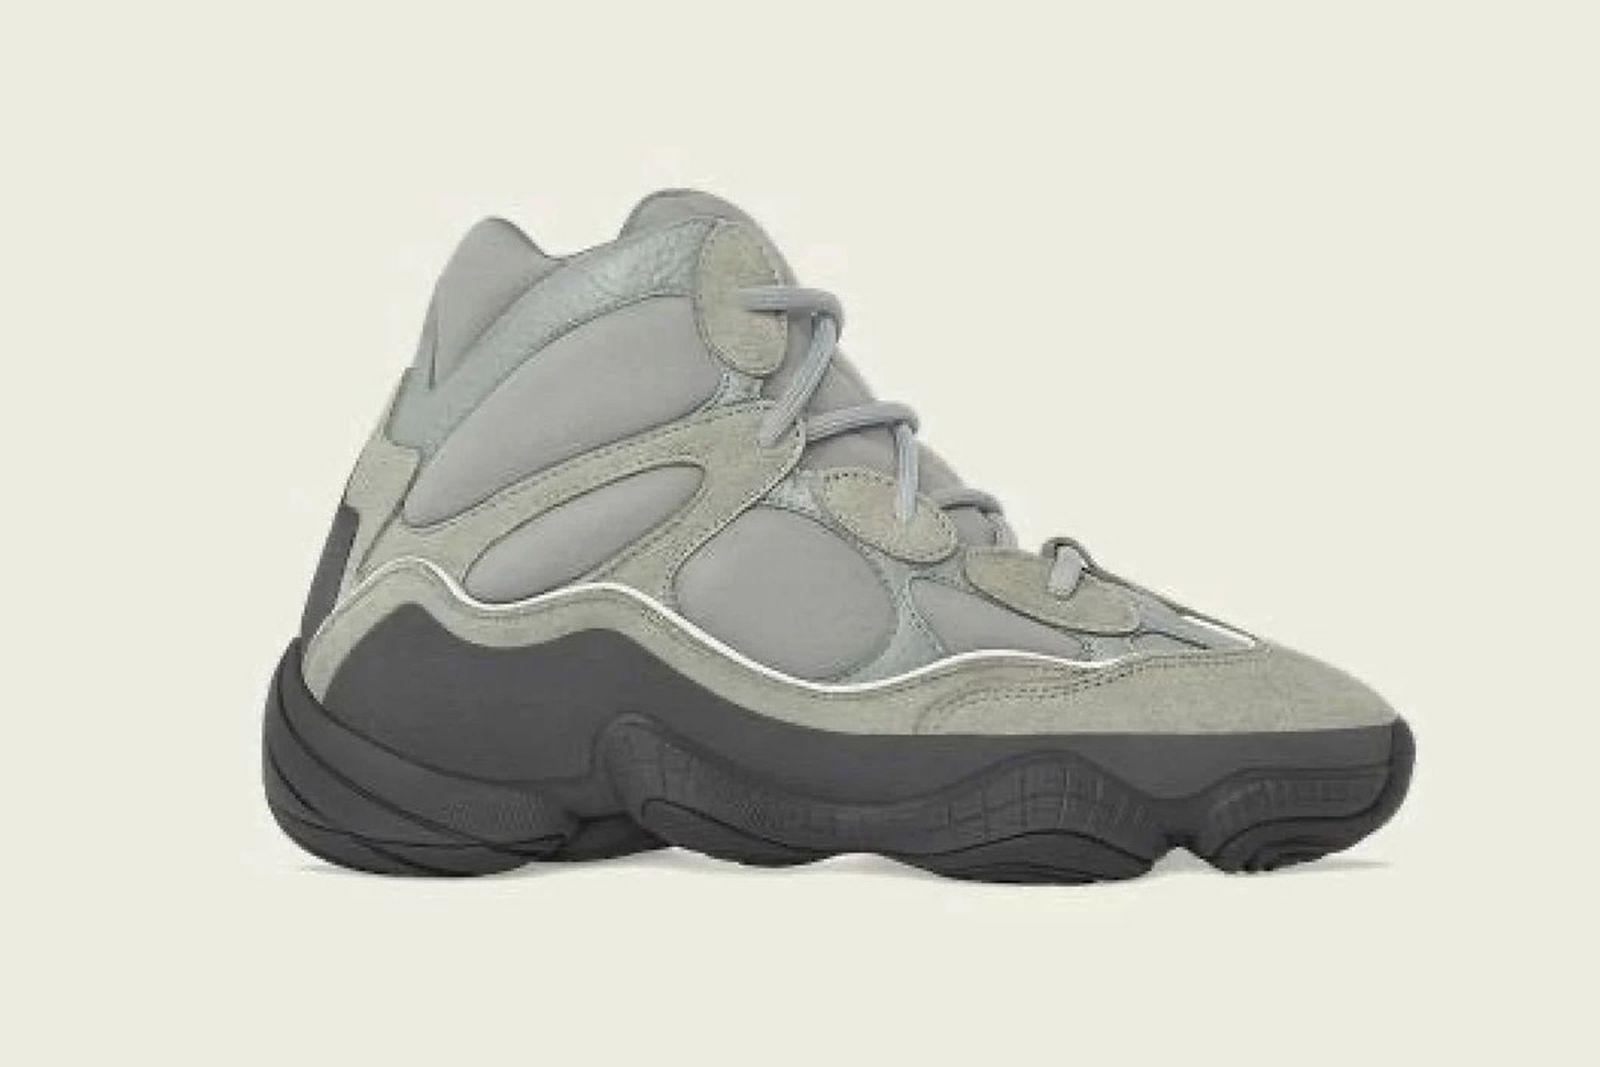 adidas-yeezy-500-high-mist-slate-release-info-02